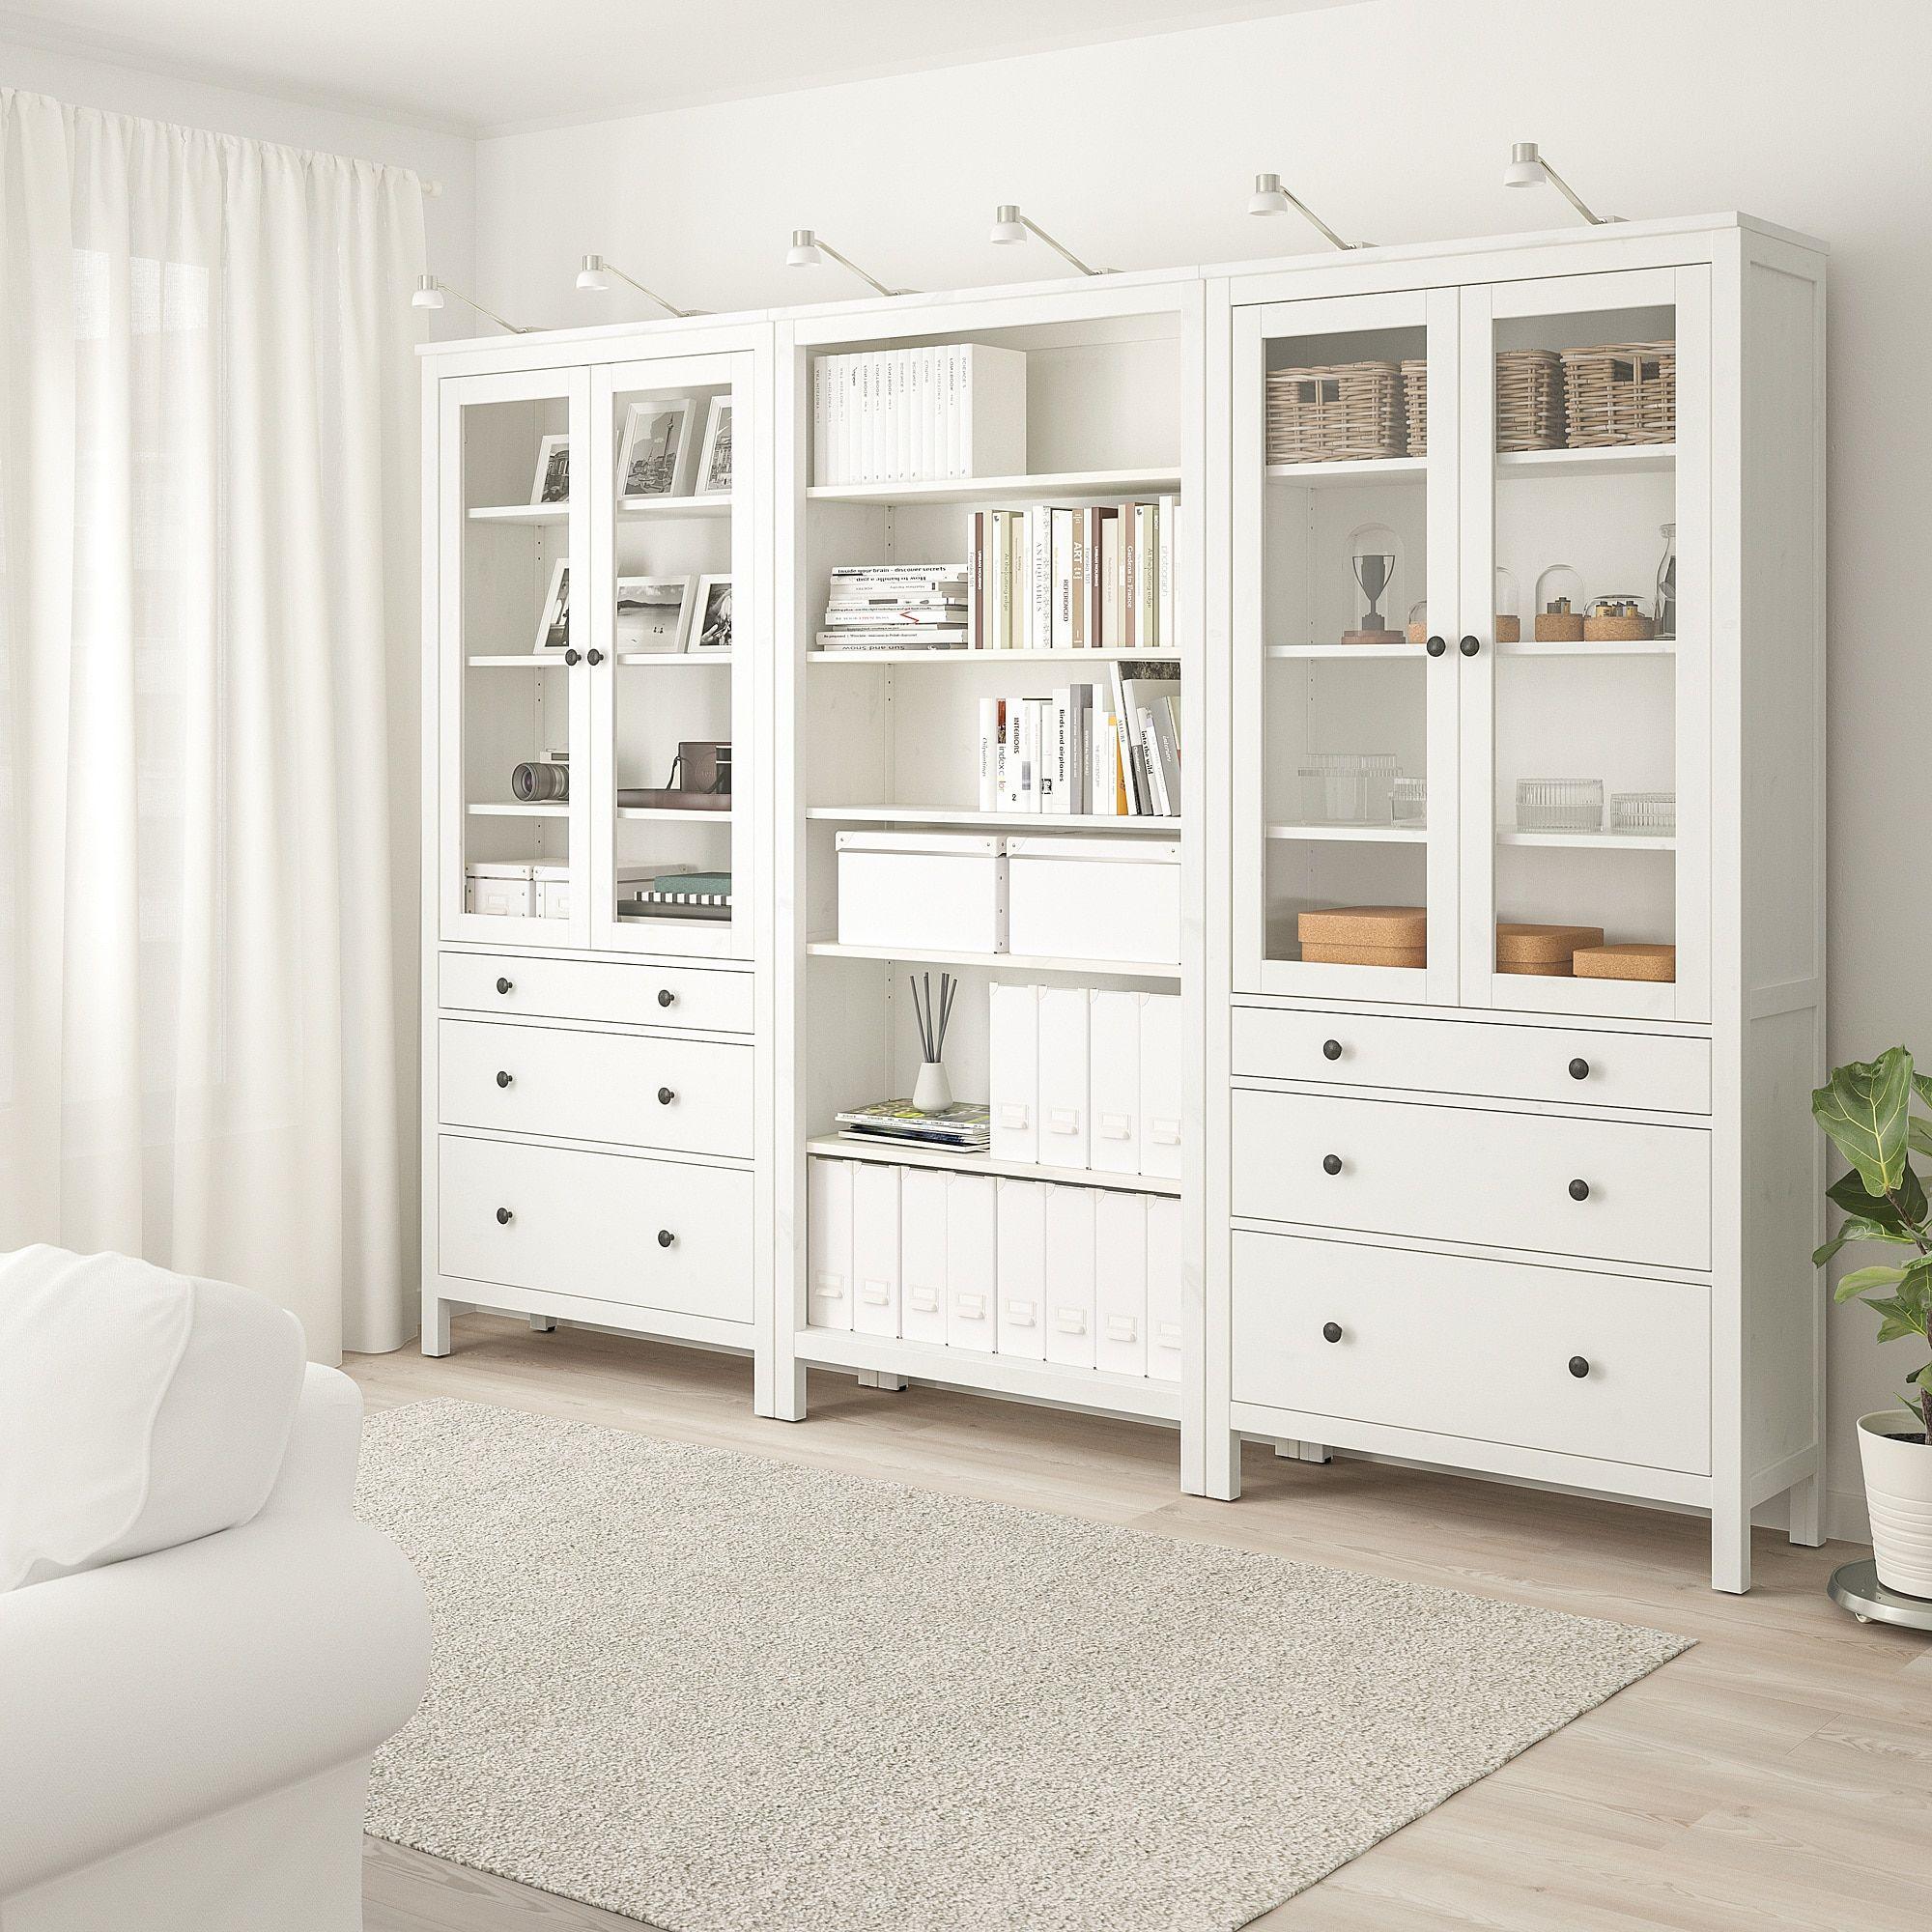 ikea hemnes storage combination w doors drawers white. Black Bedroom Furniture Sets. Home Design Ideas